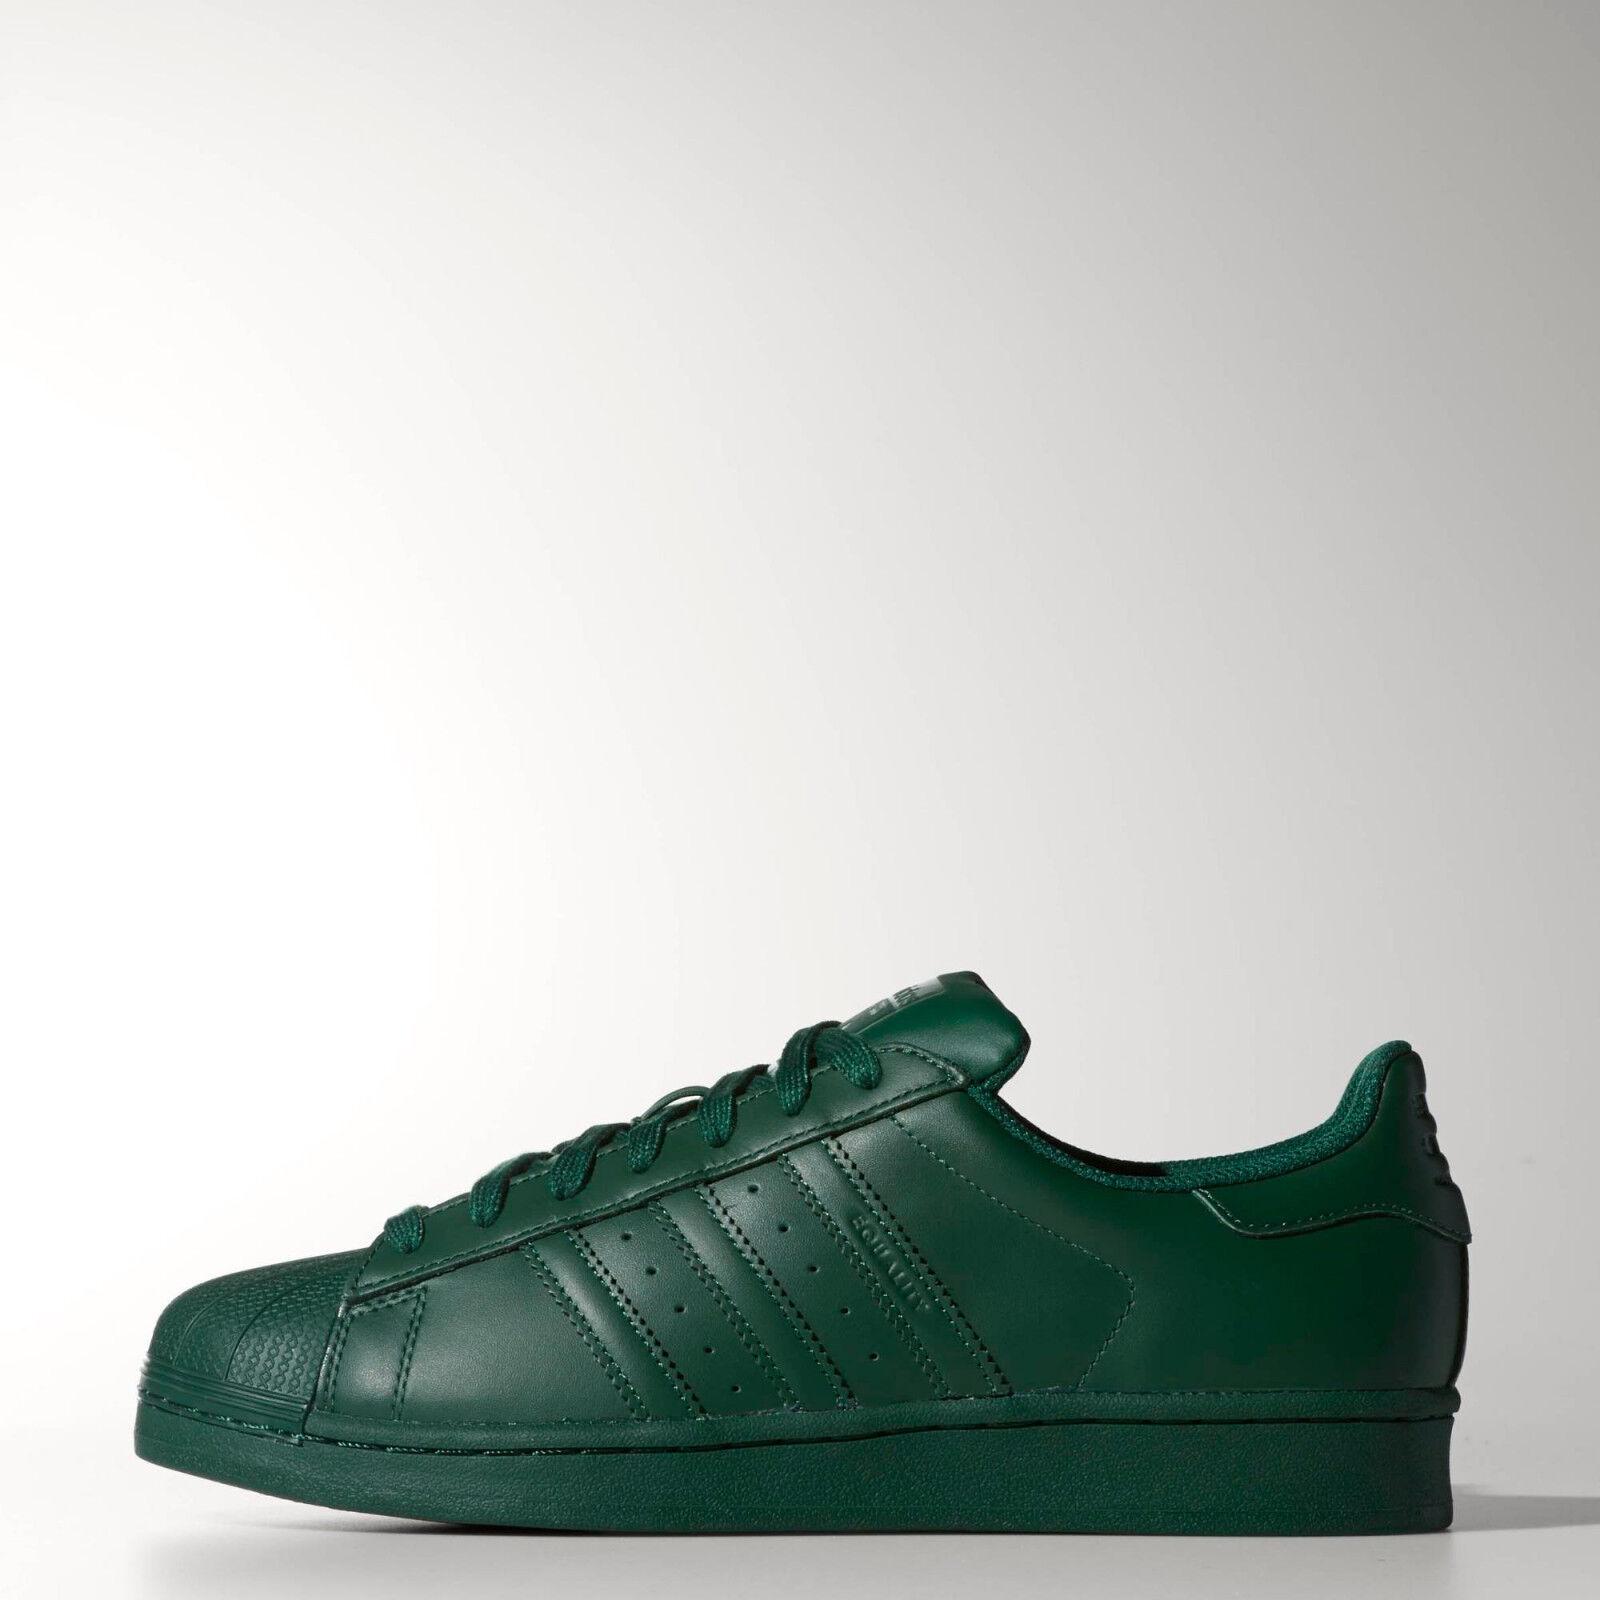 best service de47f 684f1 ... germany adidas original pharrell pharrell original williams superstar  s83396 verde oscuro supercolor pack 055ea9 a14d8 0492e